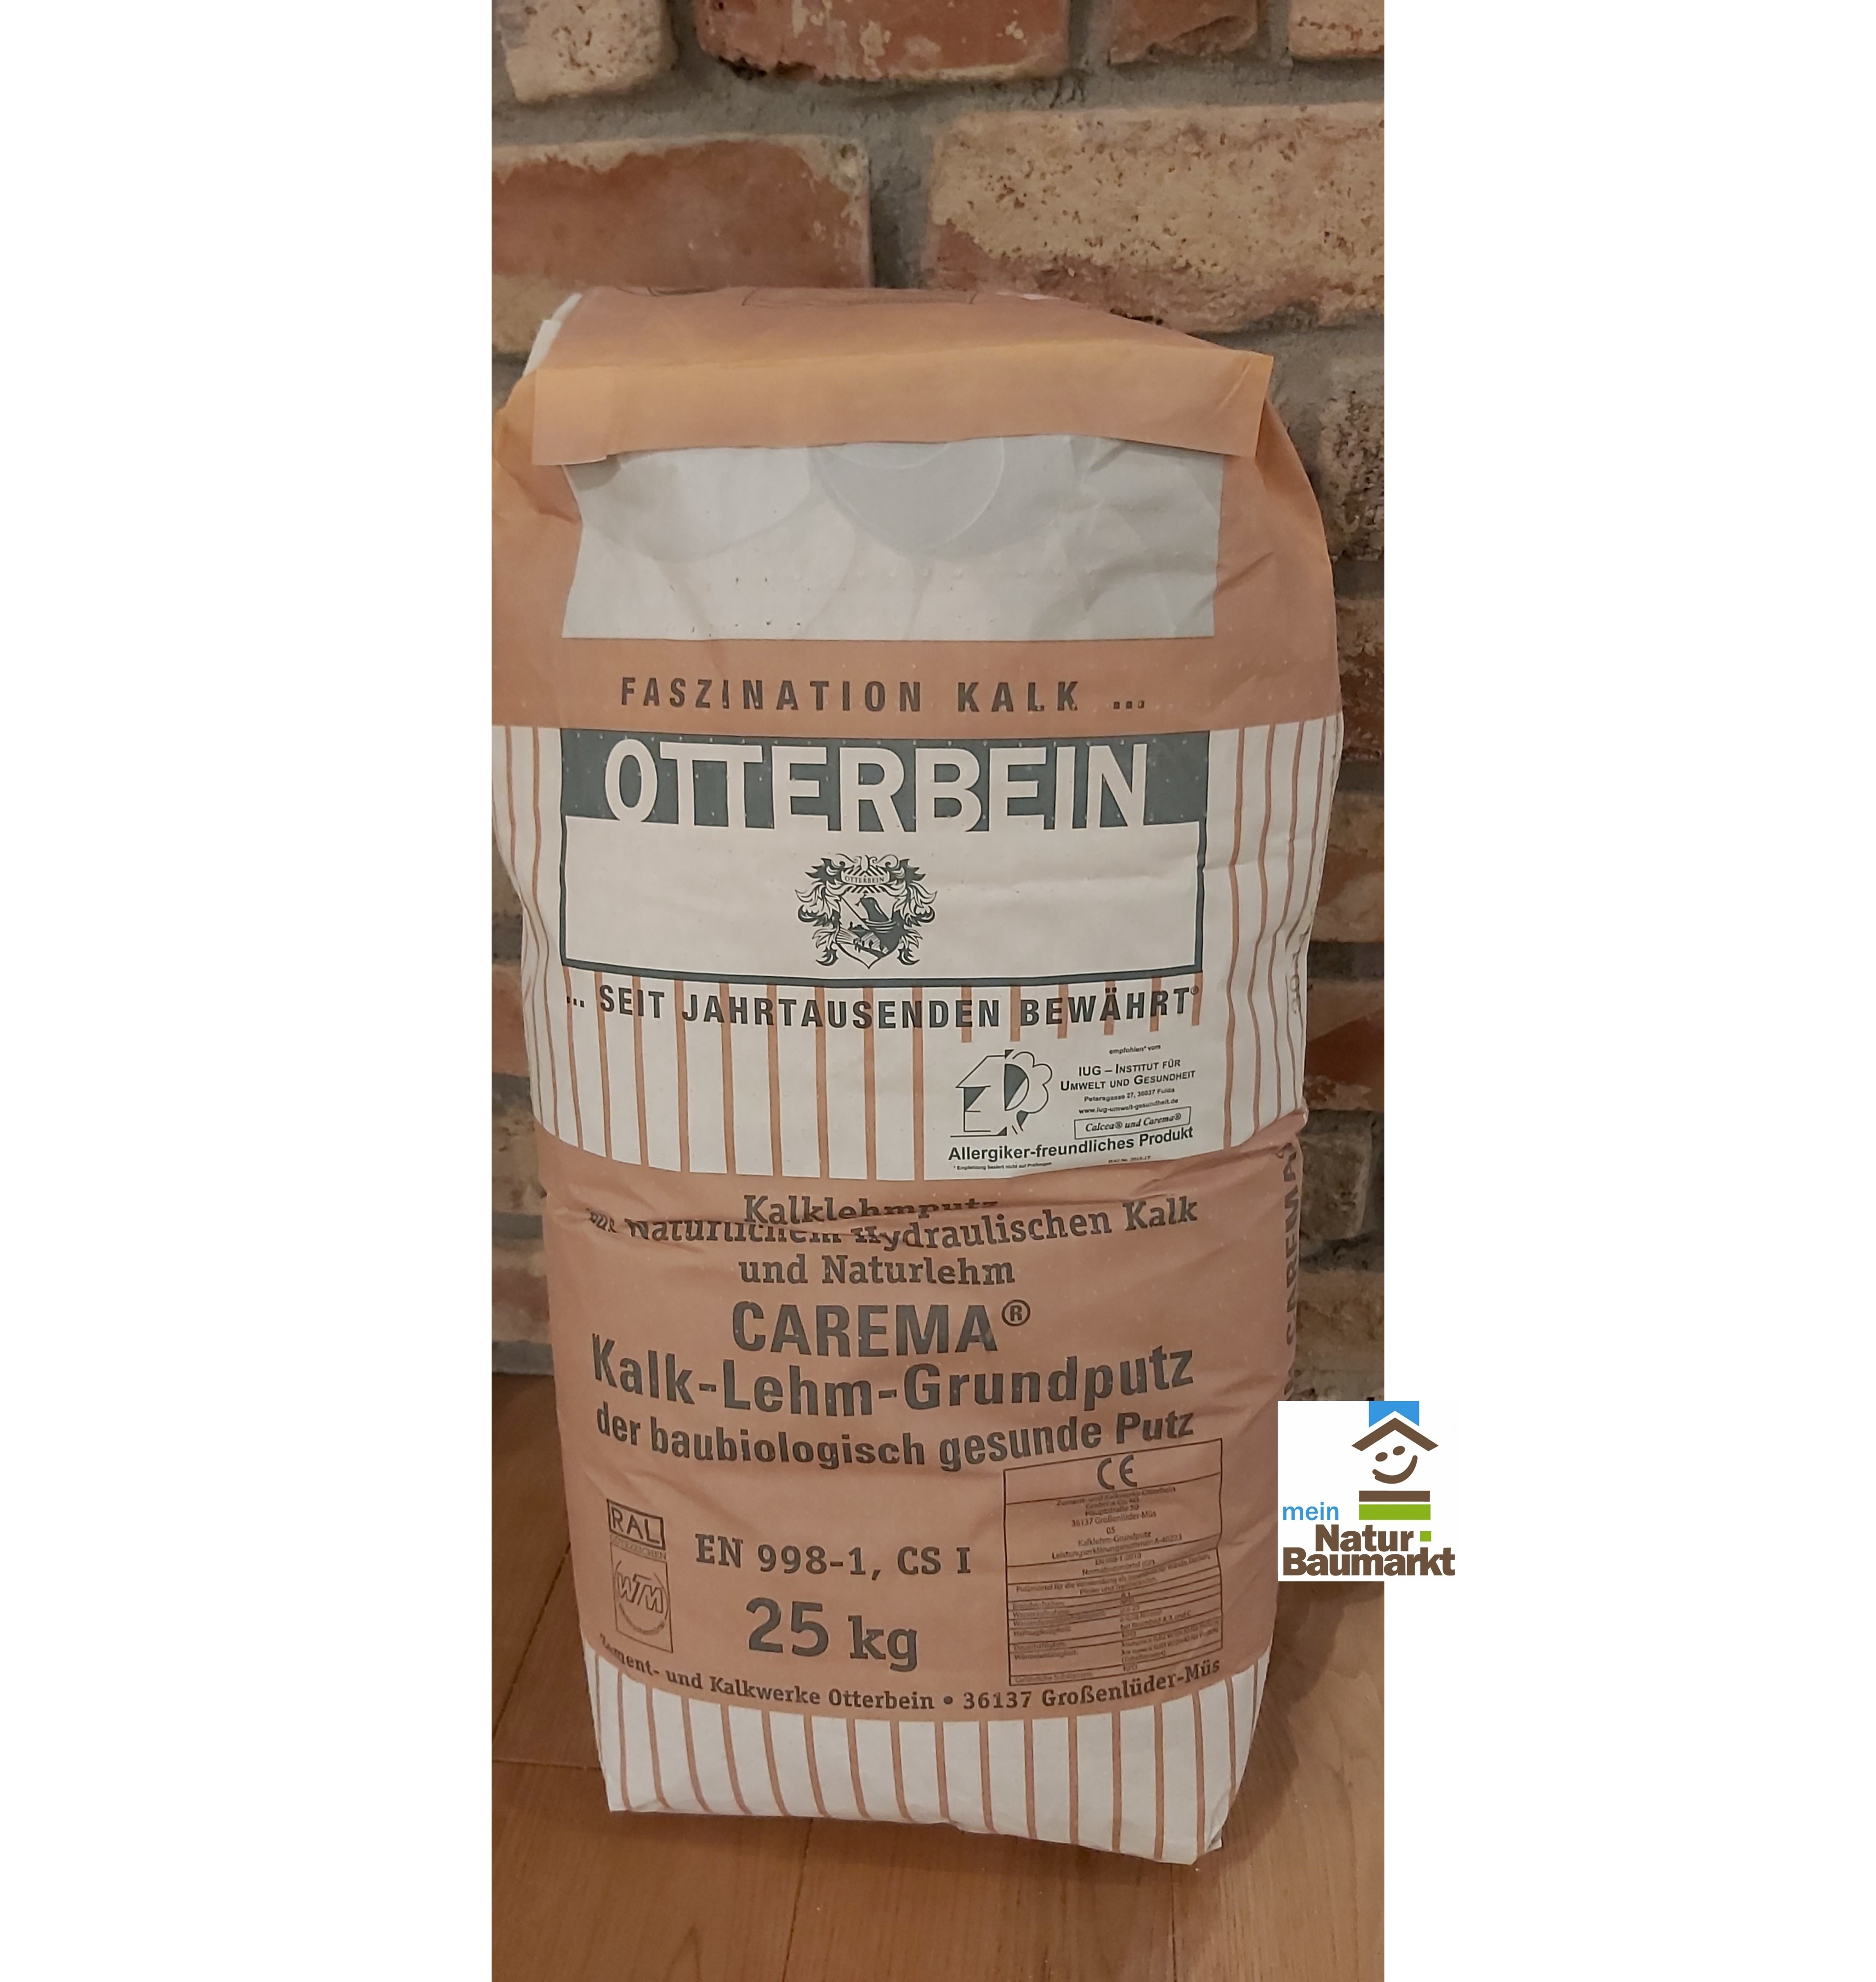 Otterbein CAREMA® Kalk - Lehm - Grundputz, 25 kg Sack